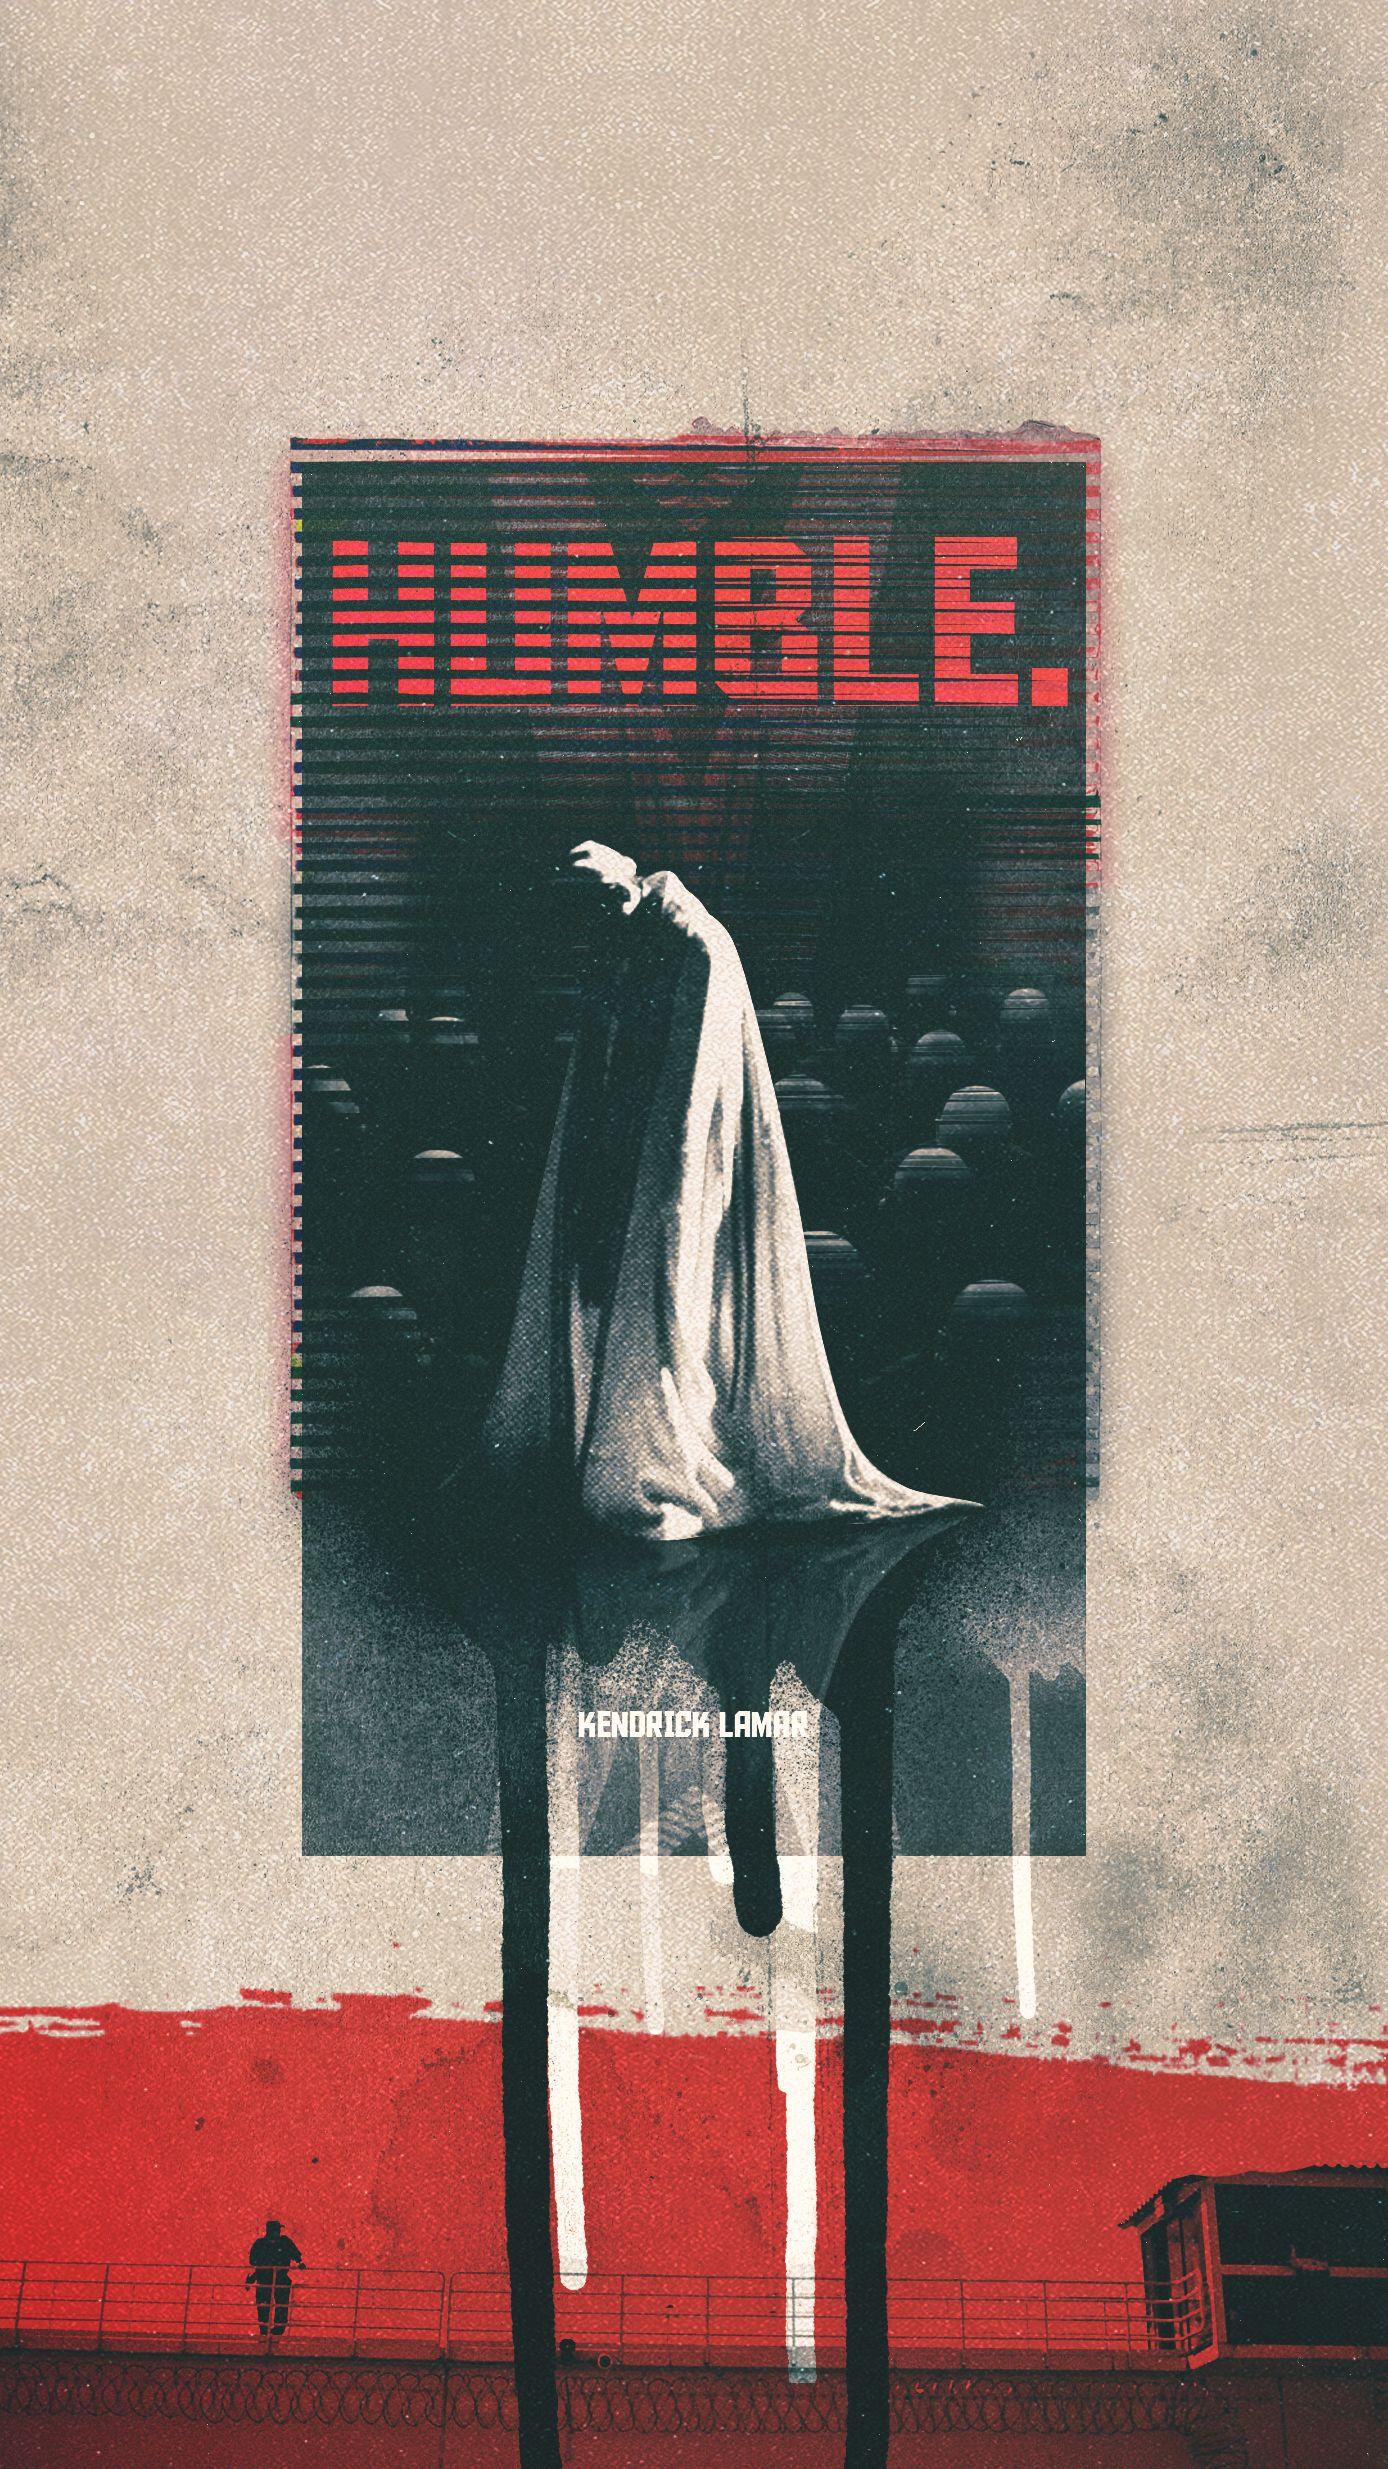 Kendrick Lamar Humbleall Of It Wallpapers Fondo De